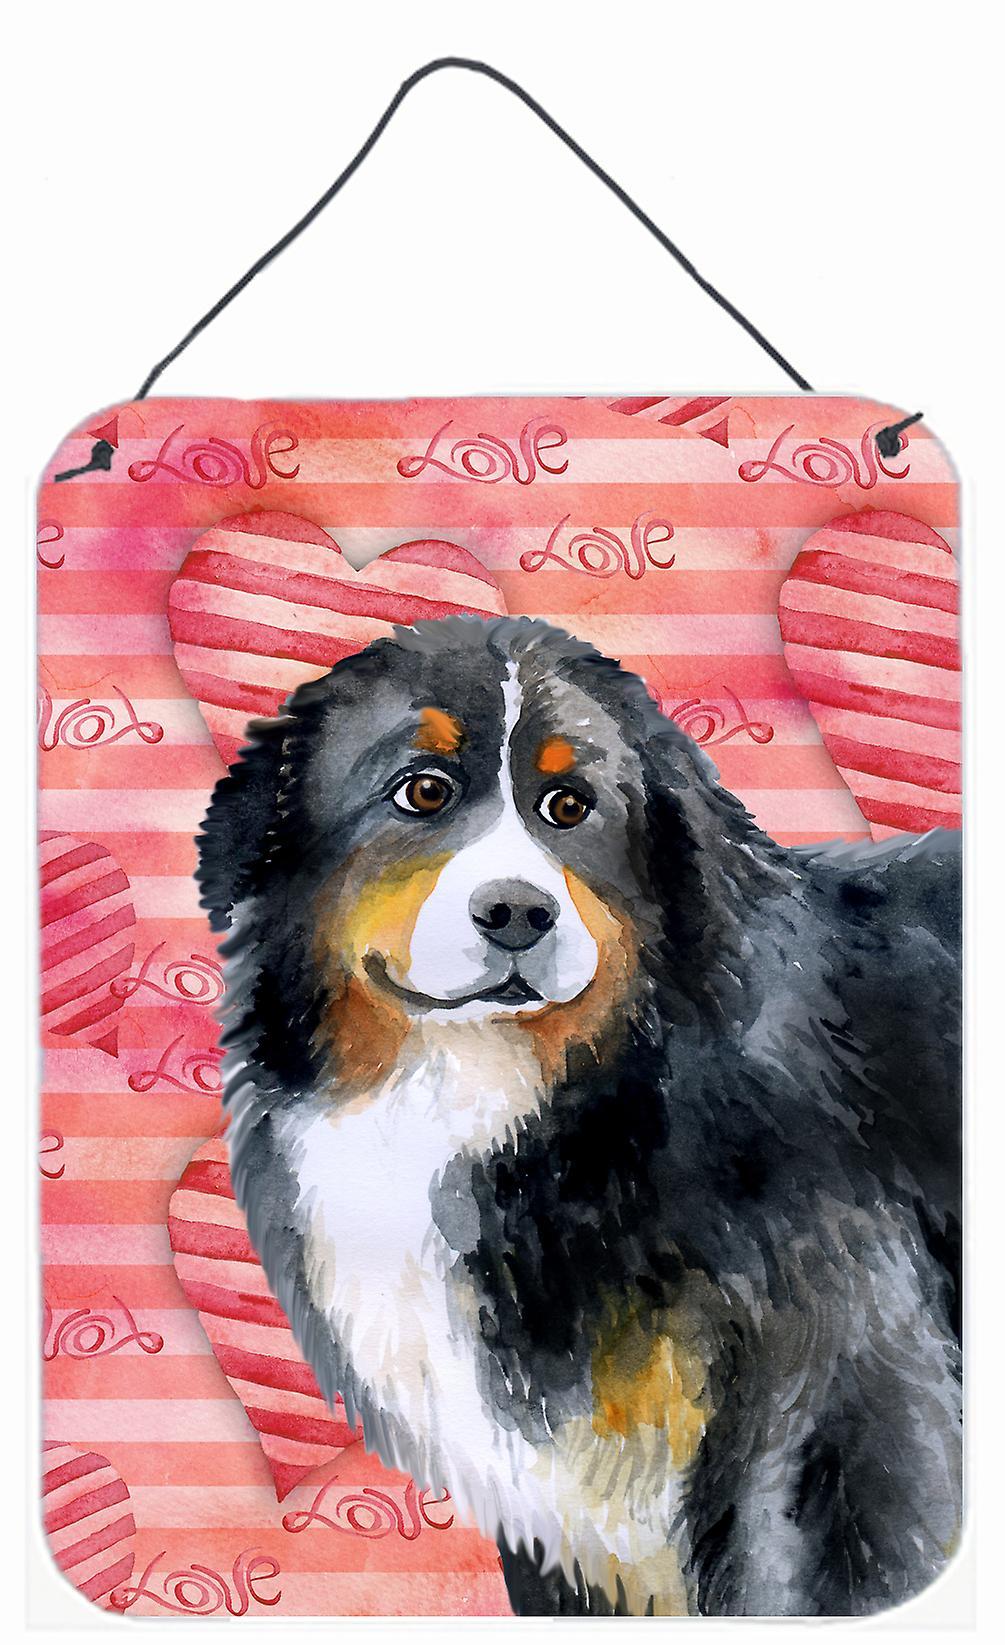 Multicolor 16 x 12 Carolines Treasures Greater Swiss Mountain Dog Aluminium Metal Wall or Door Hanging Prints